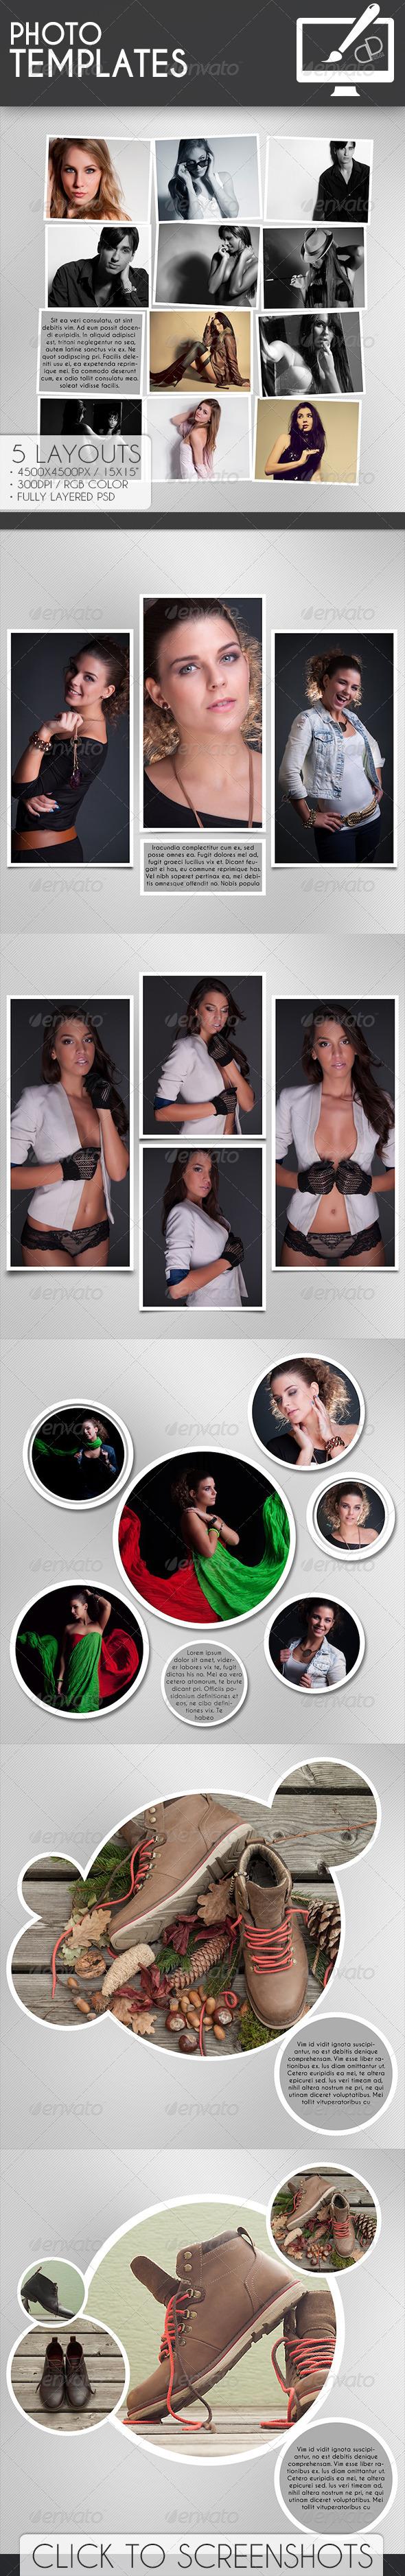 Photo Templates - Photo Templates Graphics